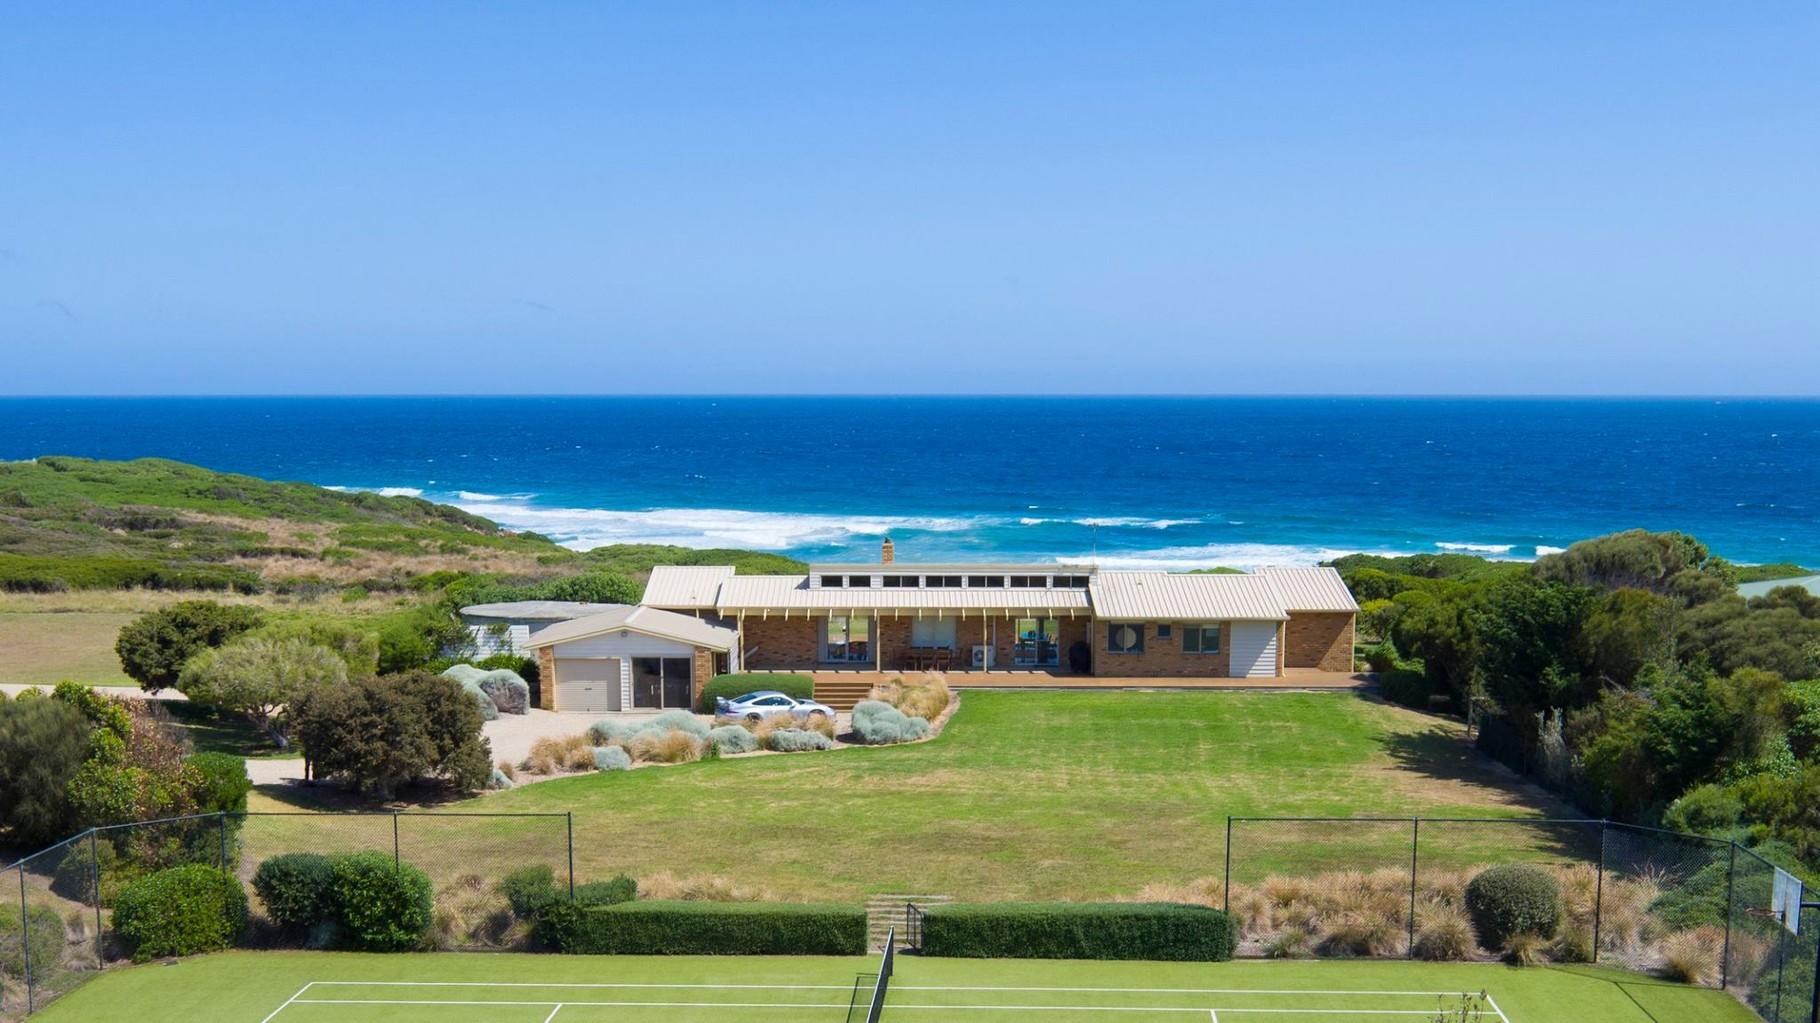 Phillip island berrys beach beachfront ocean views for Beach house designs phillip island